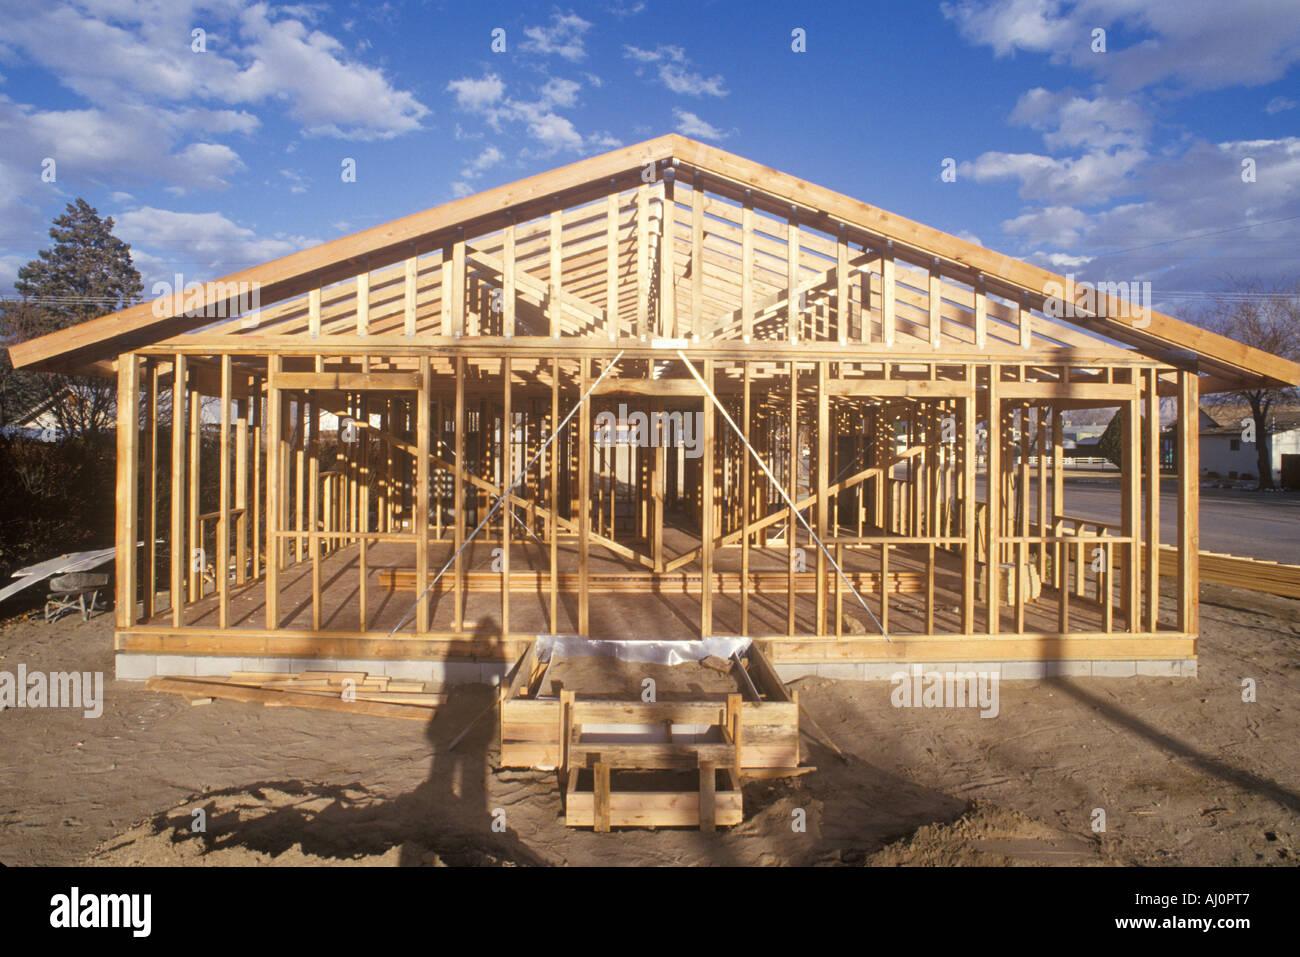 Holzrahmen Haus im Bau Lone Pine CA Stockfoto, Bild: 8333574 - Alamy